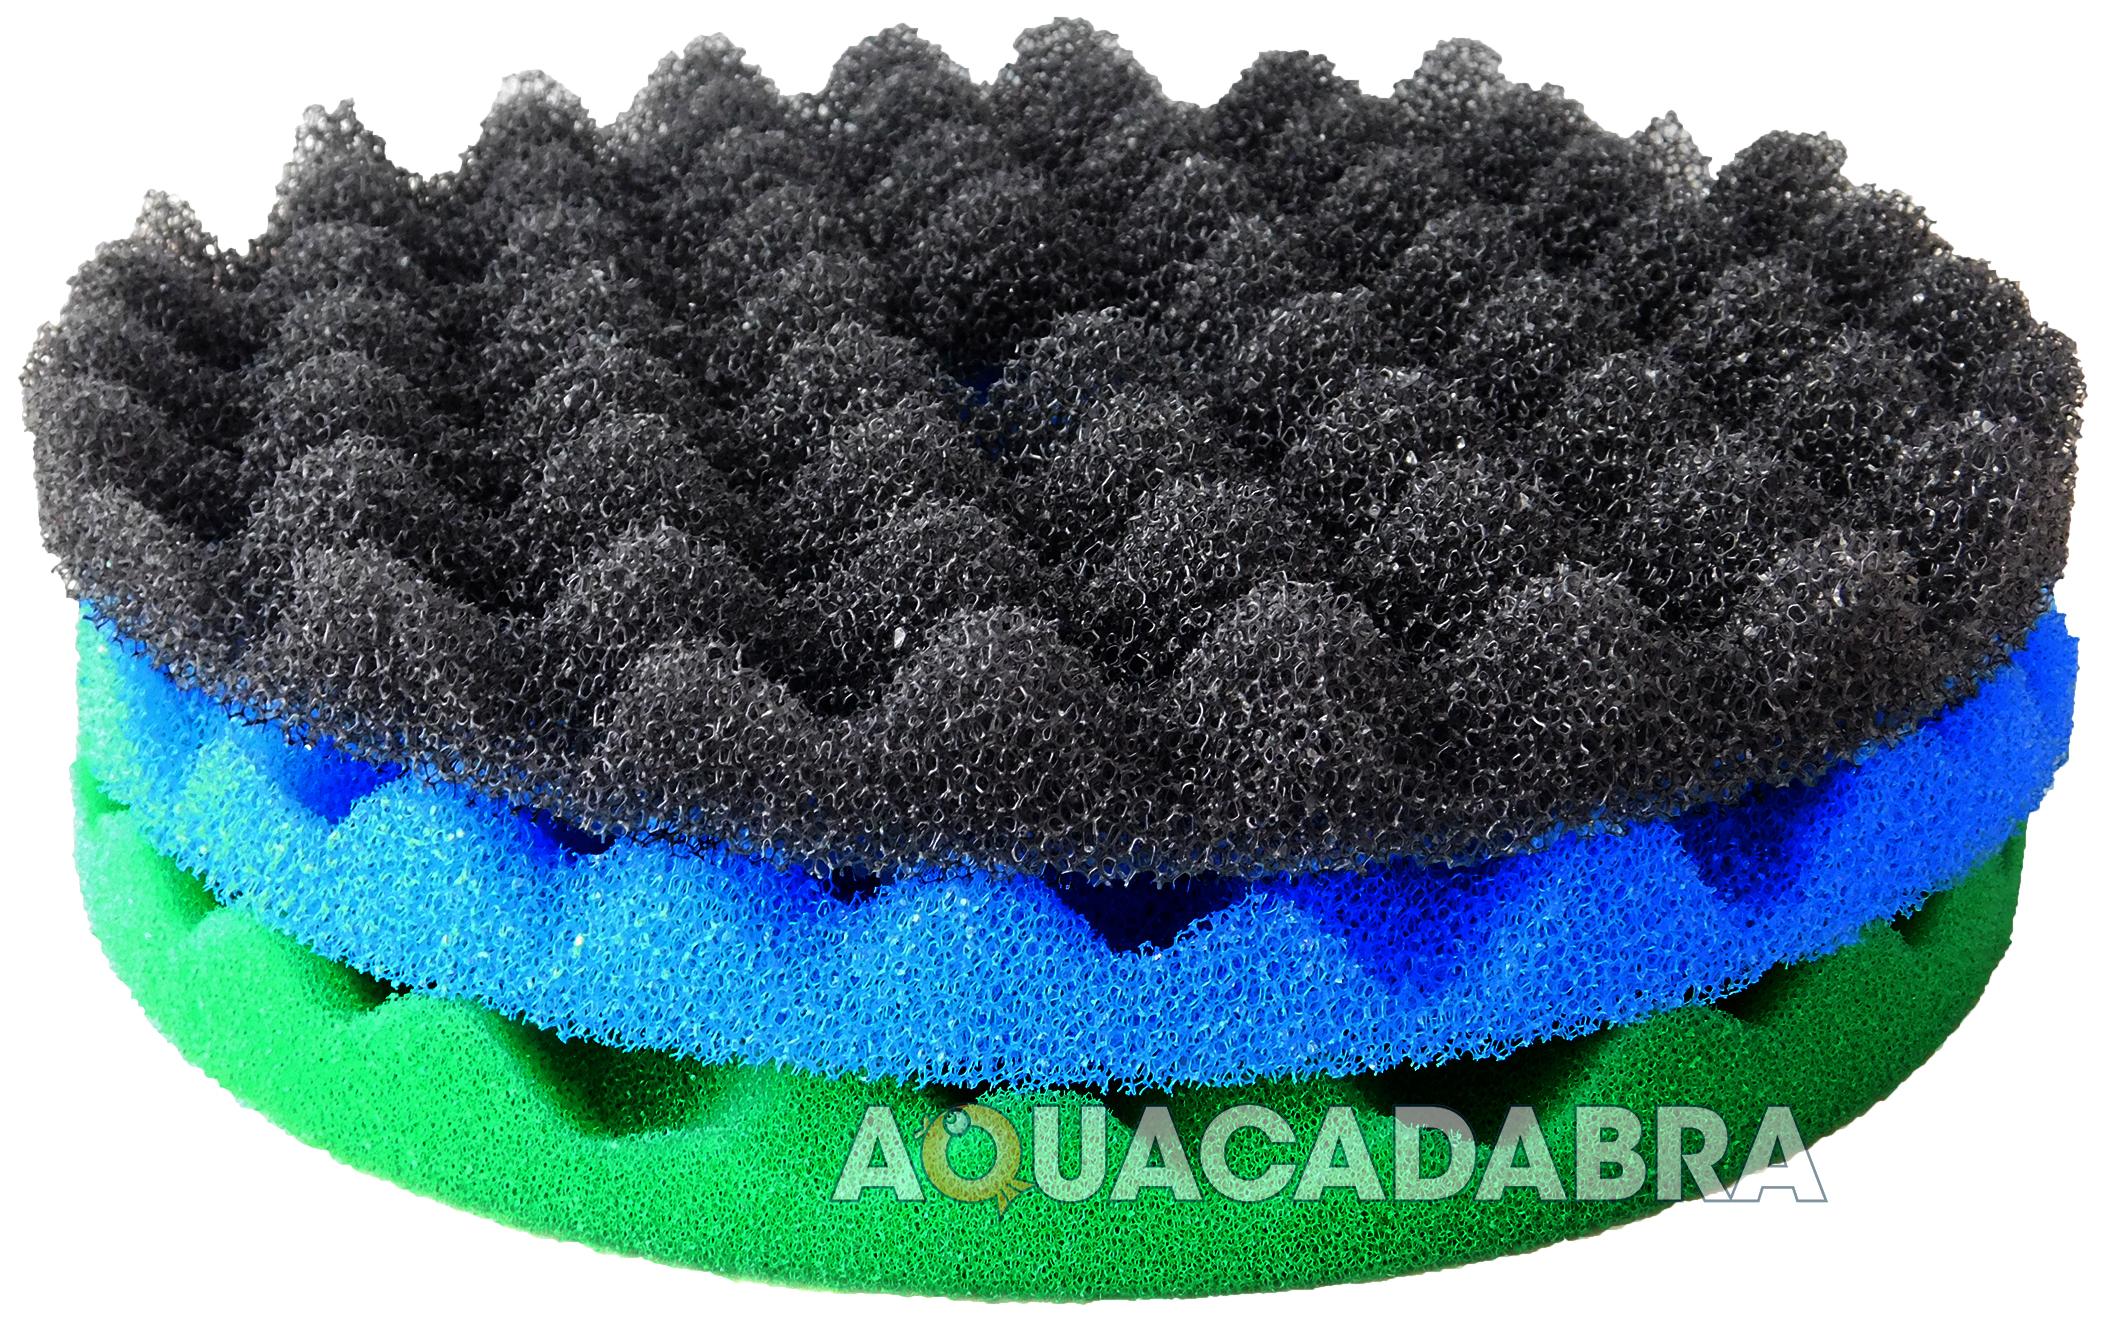 Cloverleaf cl1 cl2 cl3 replacement fish pond foam filter for Fish pond filter sponges